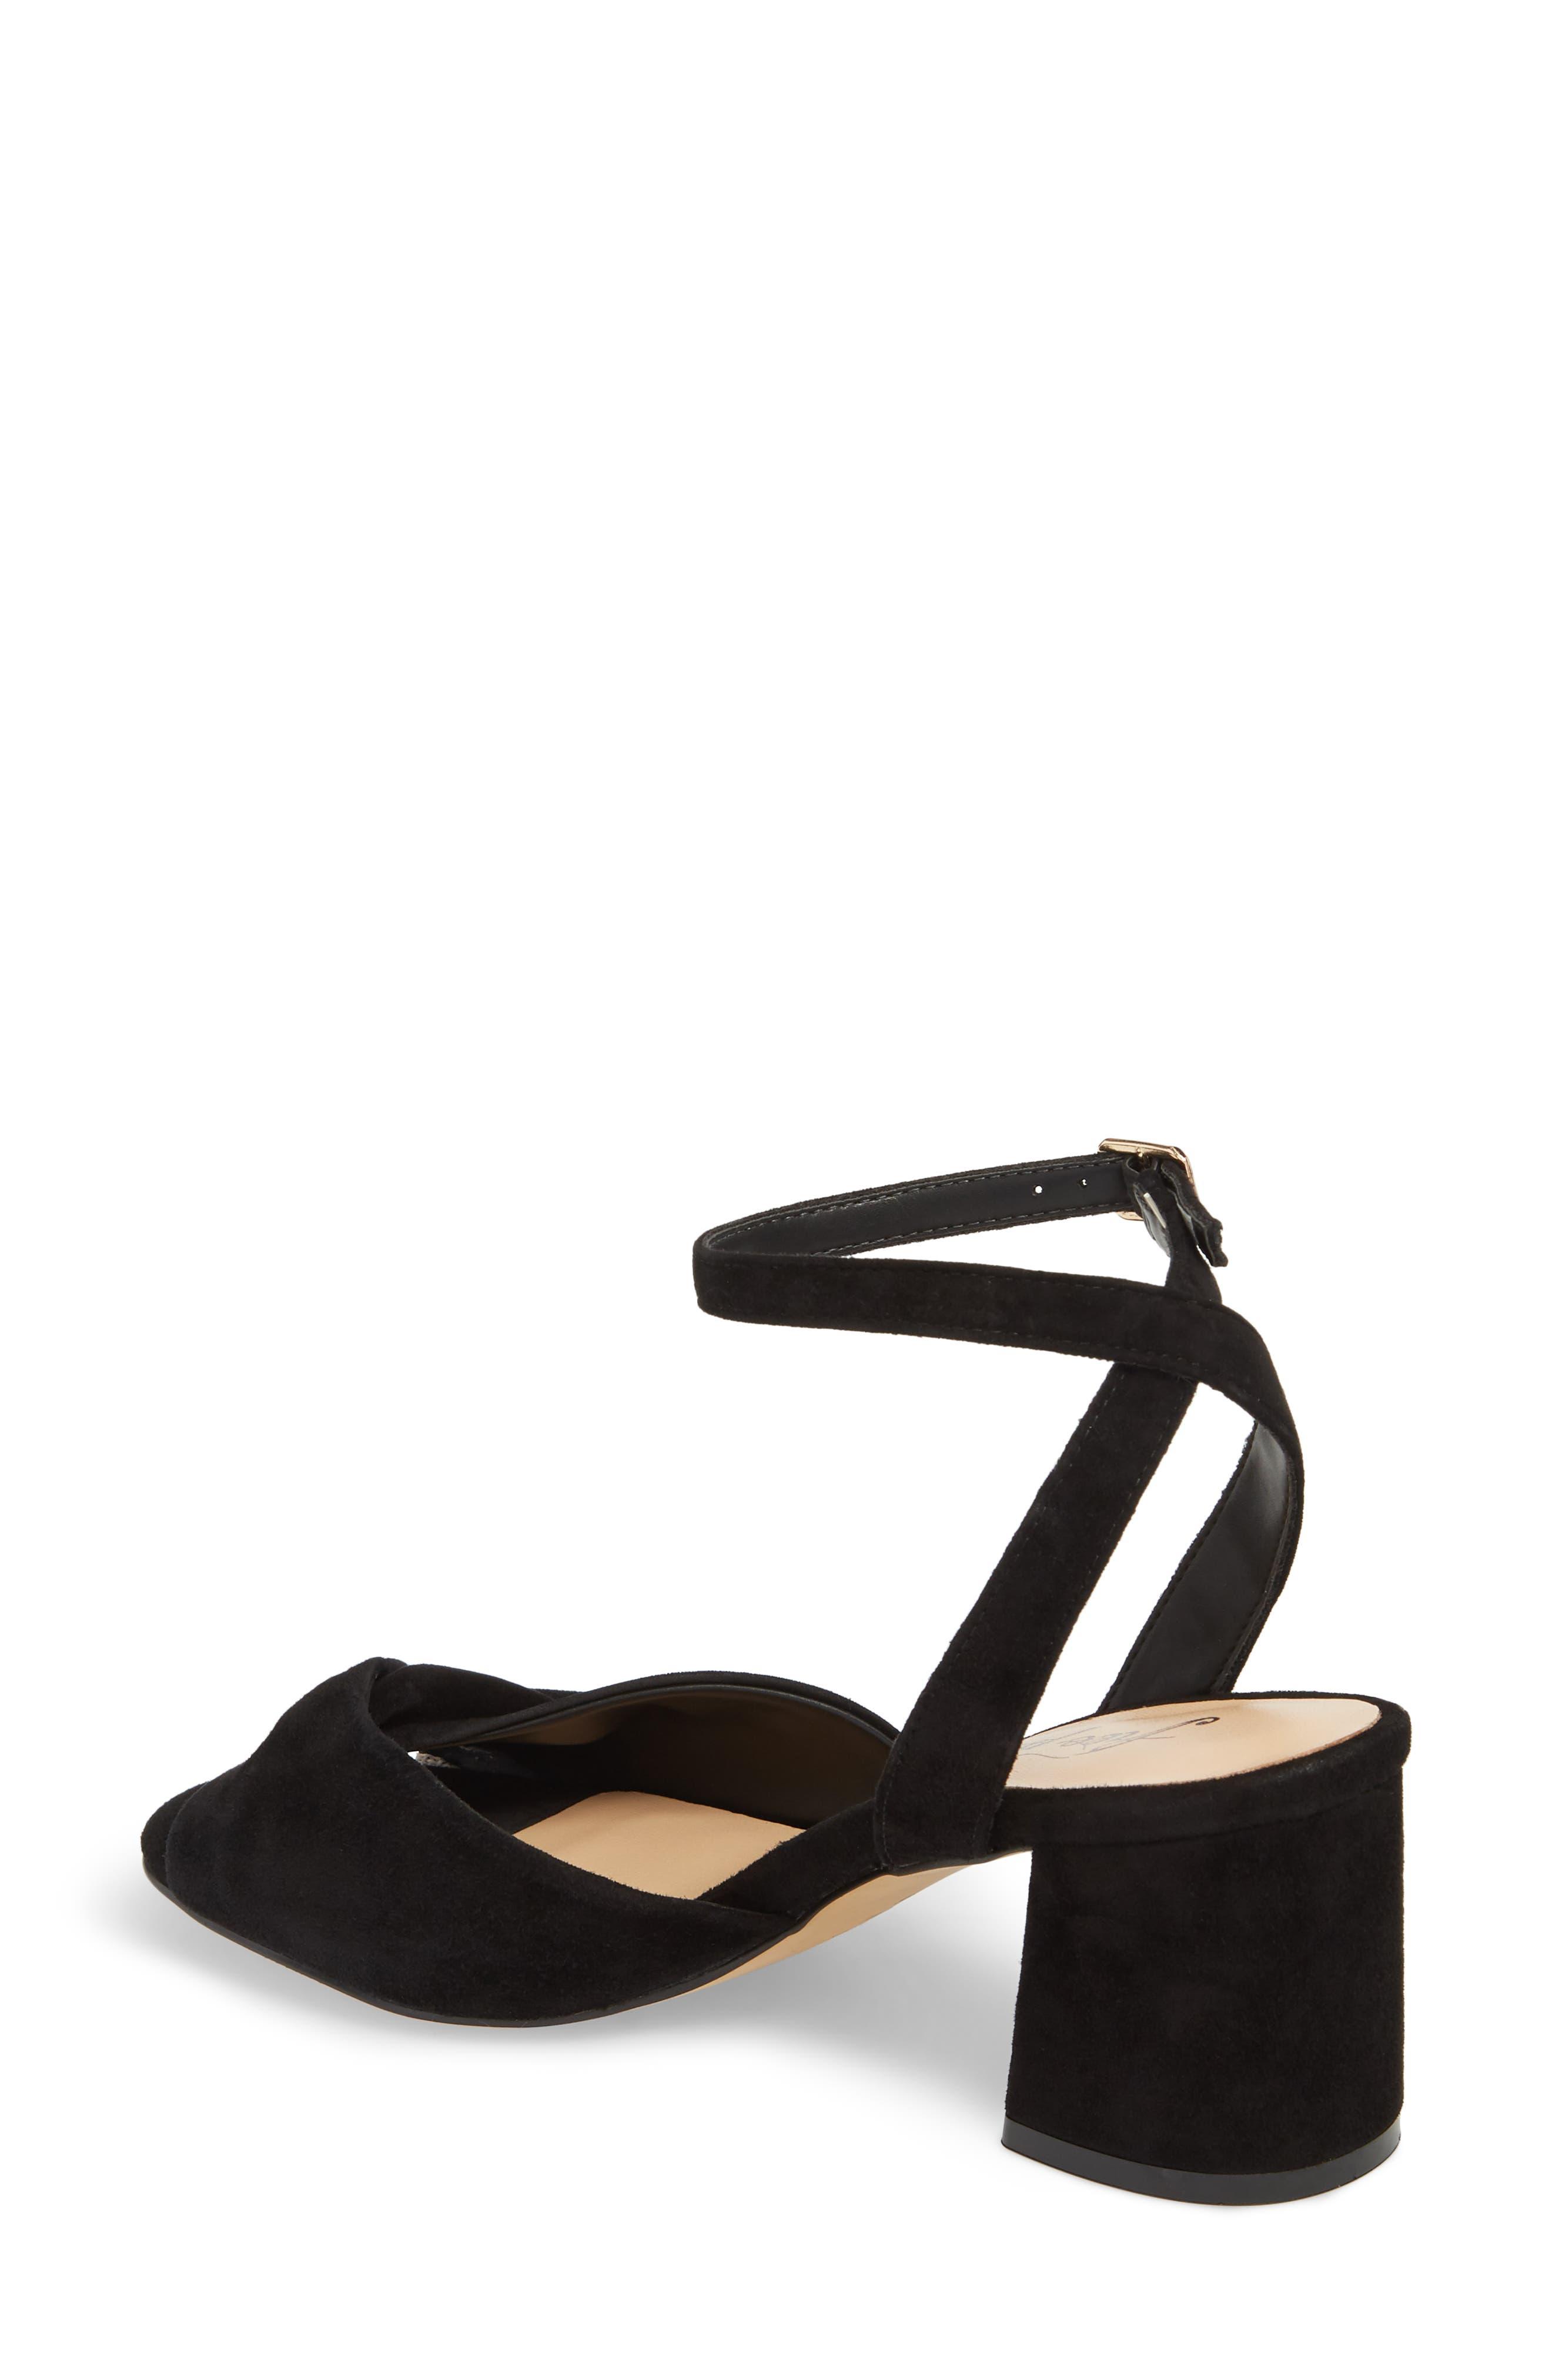 Gisele Twisted Sandal,                             Alternate thumbnail 2, color,                             Black